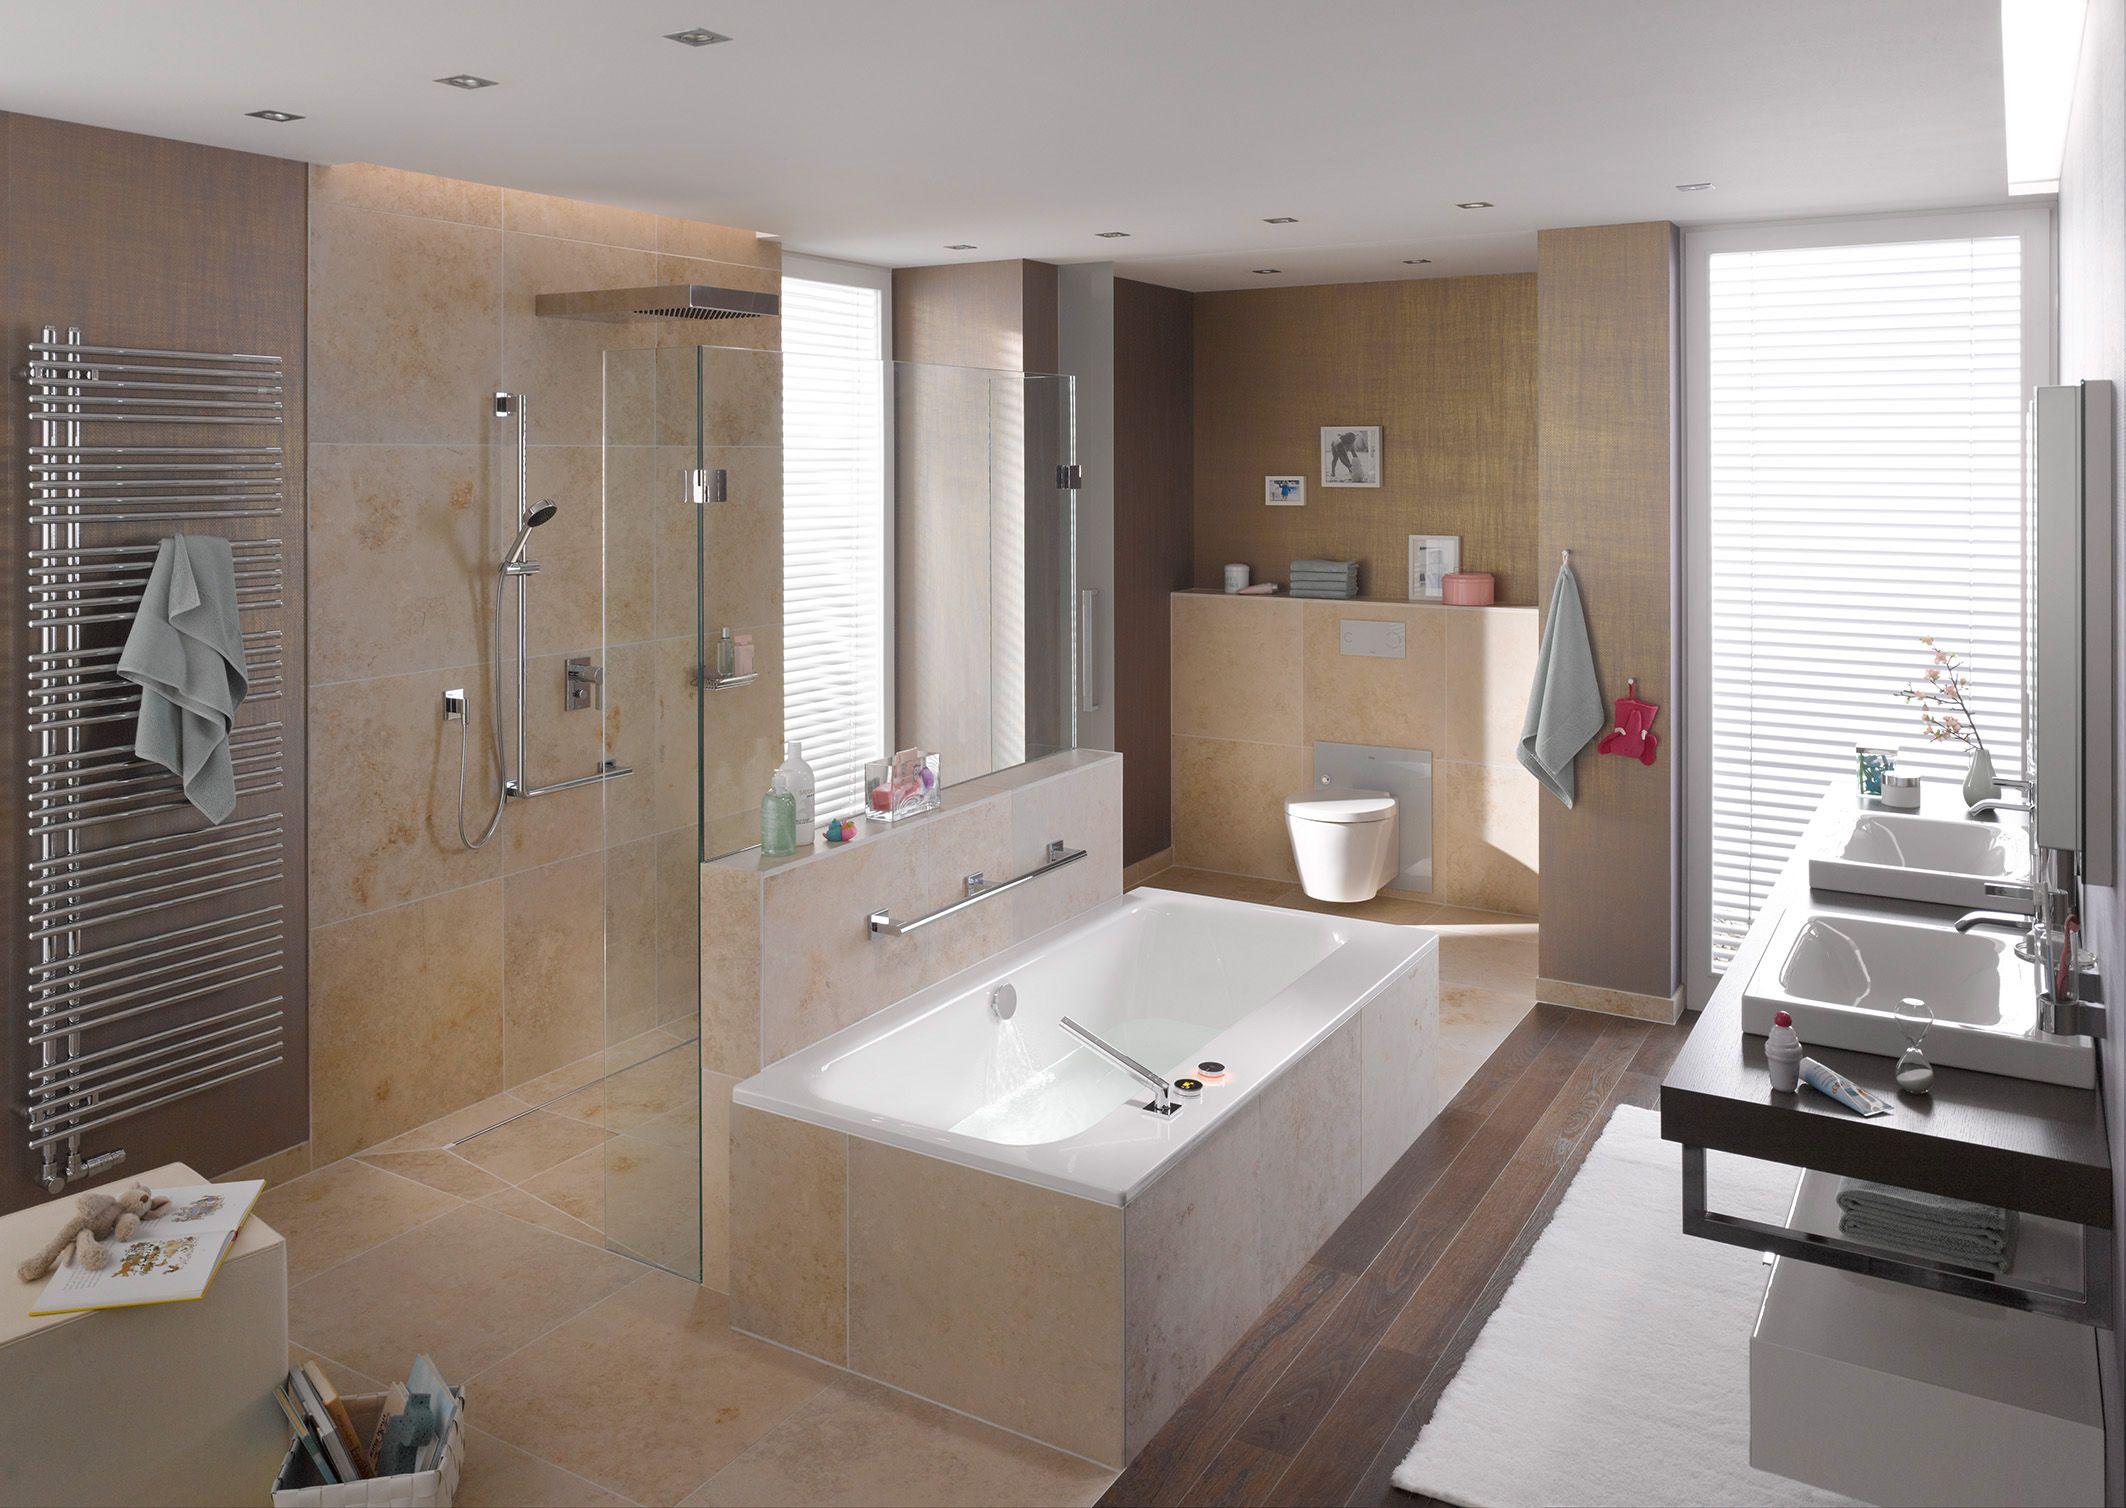 znalezione obrazy dla zapytania salle de bain - Photos Salle De Bains